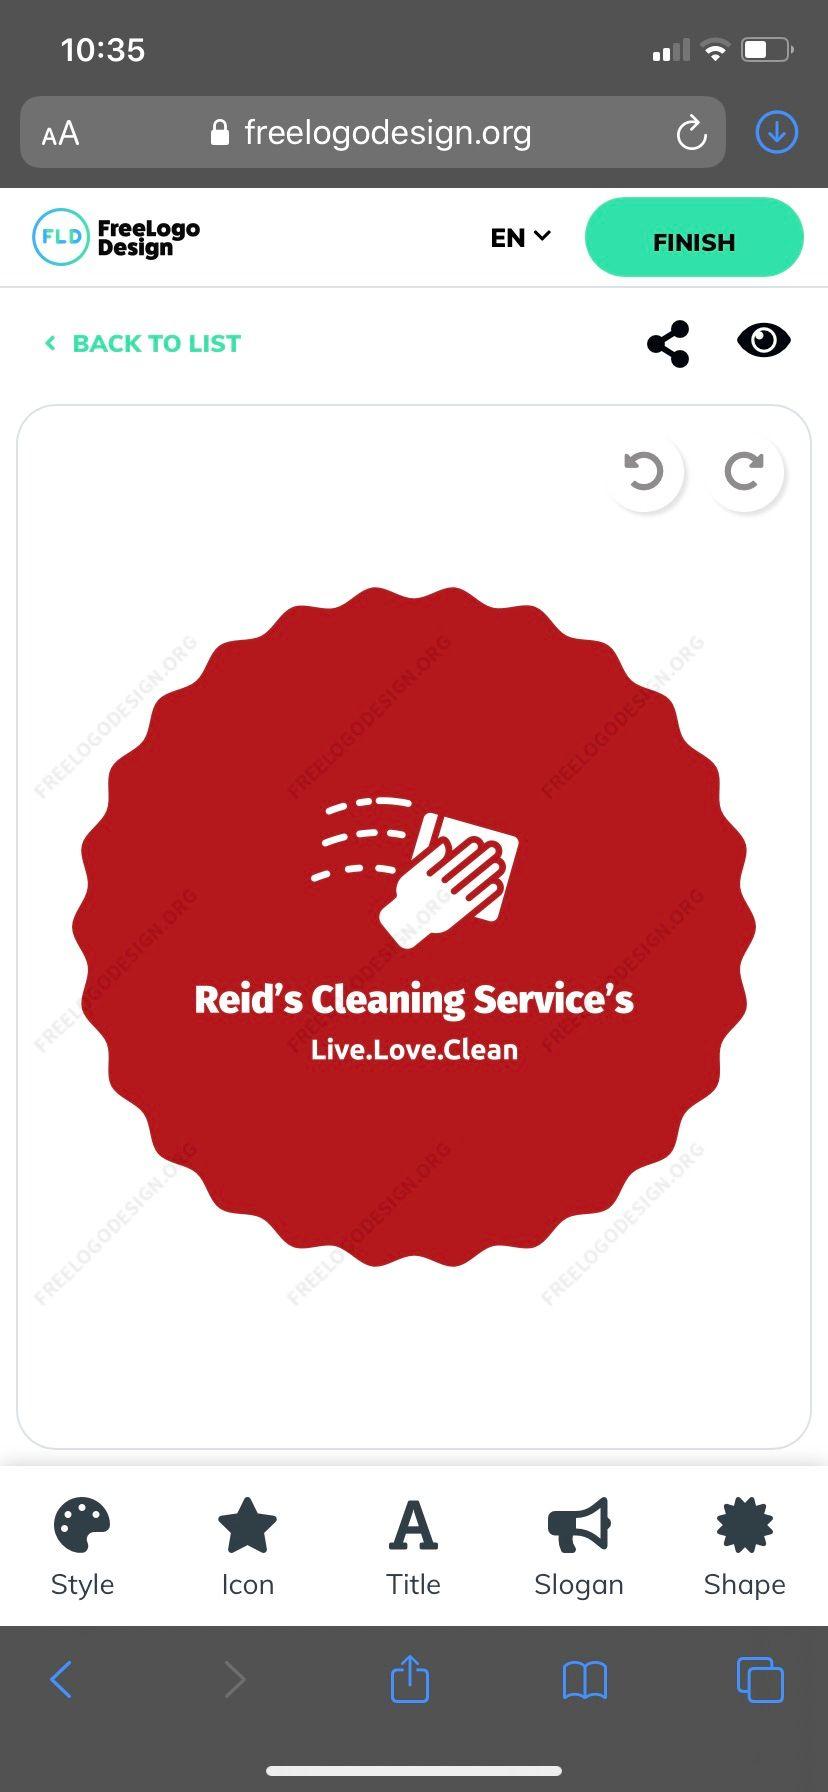 Reid's Cleaning